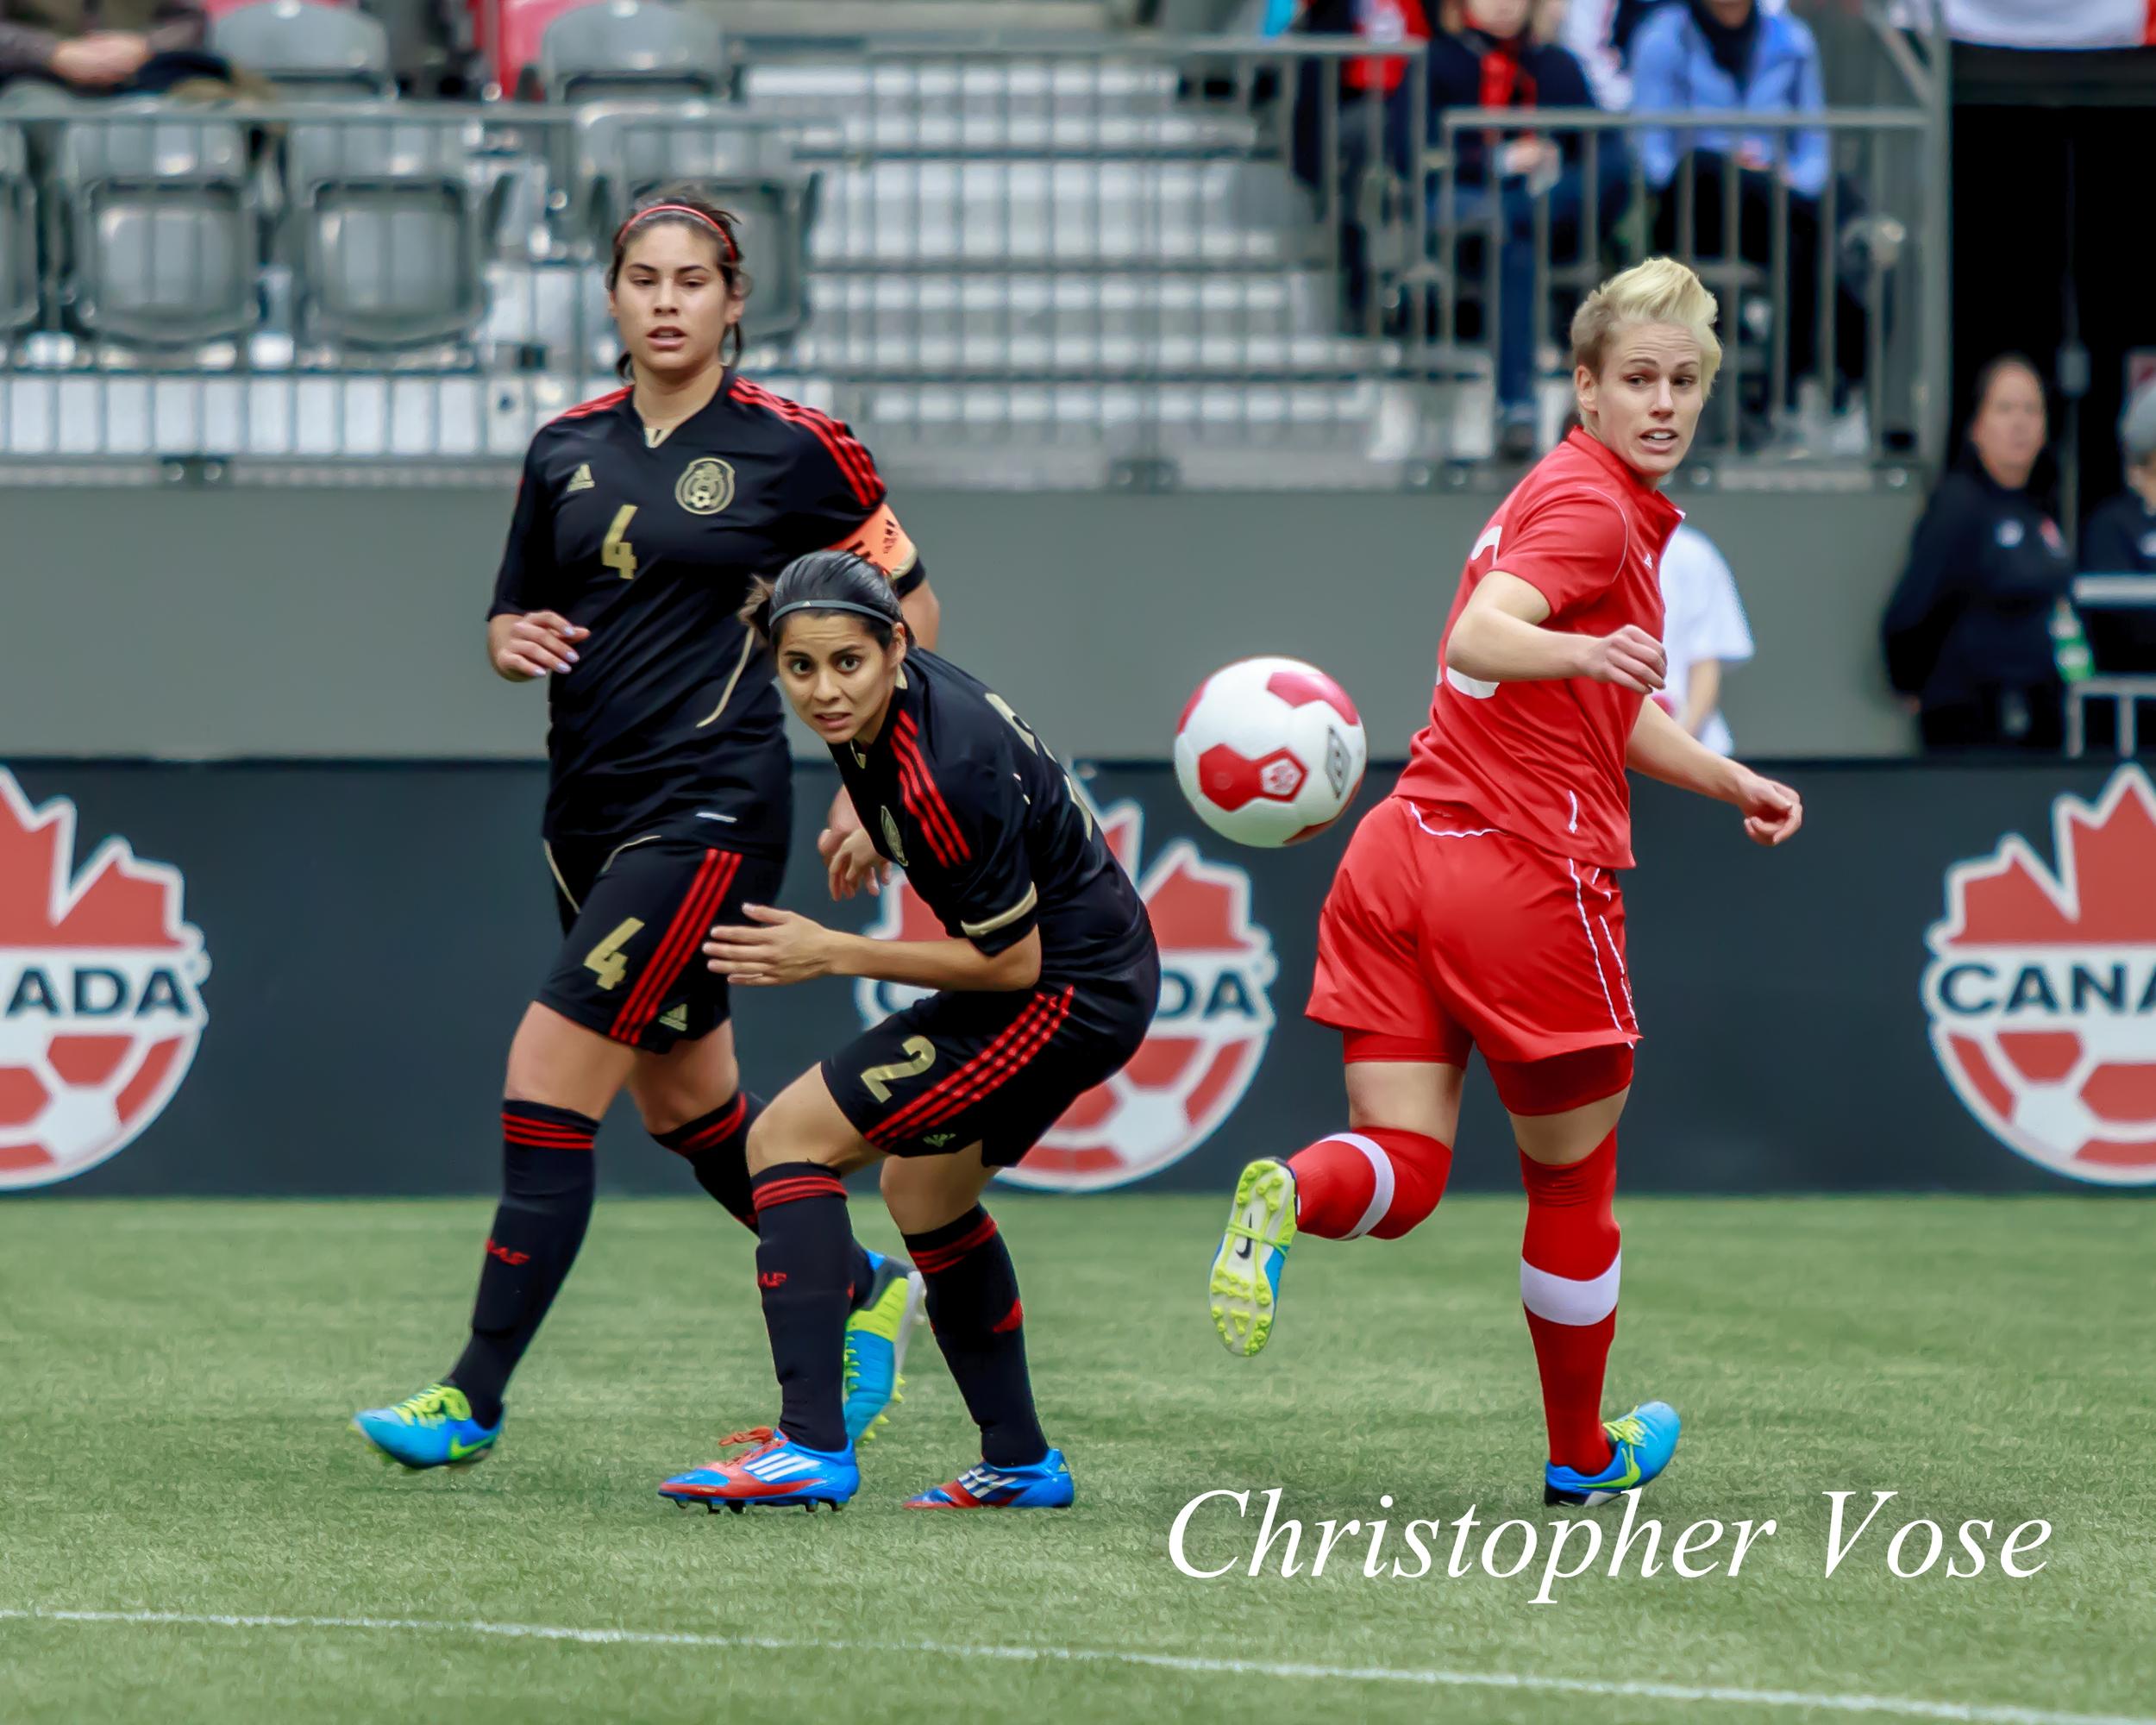 2013-11-24 Alina Garciamendez, Kenti Robles, and Sophie Schmidt.jpg